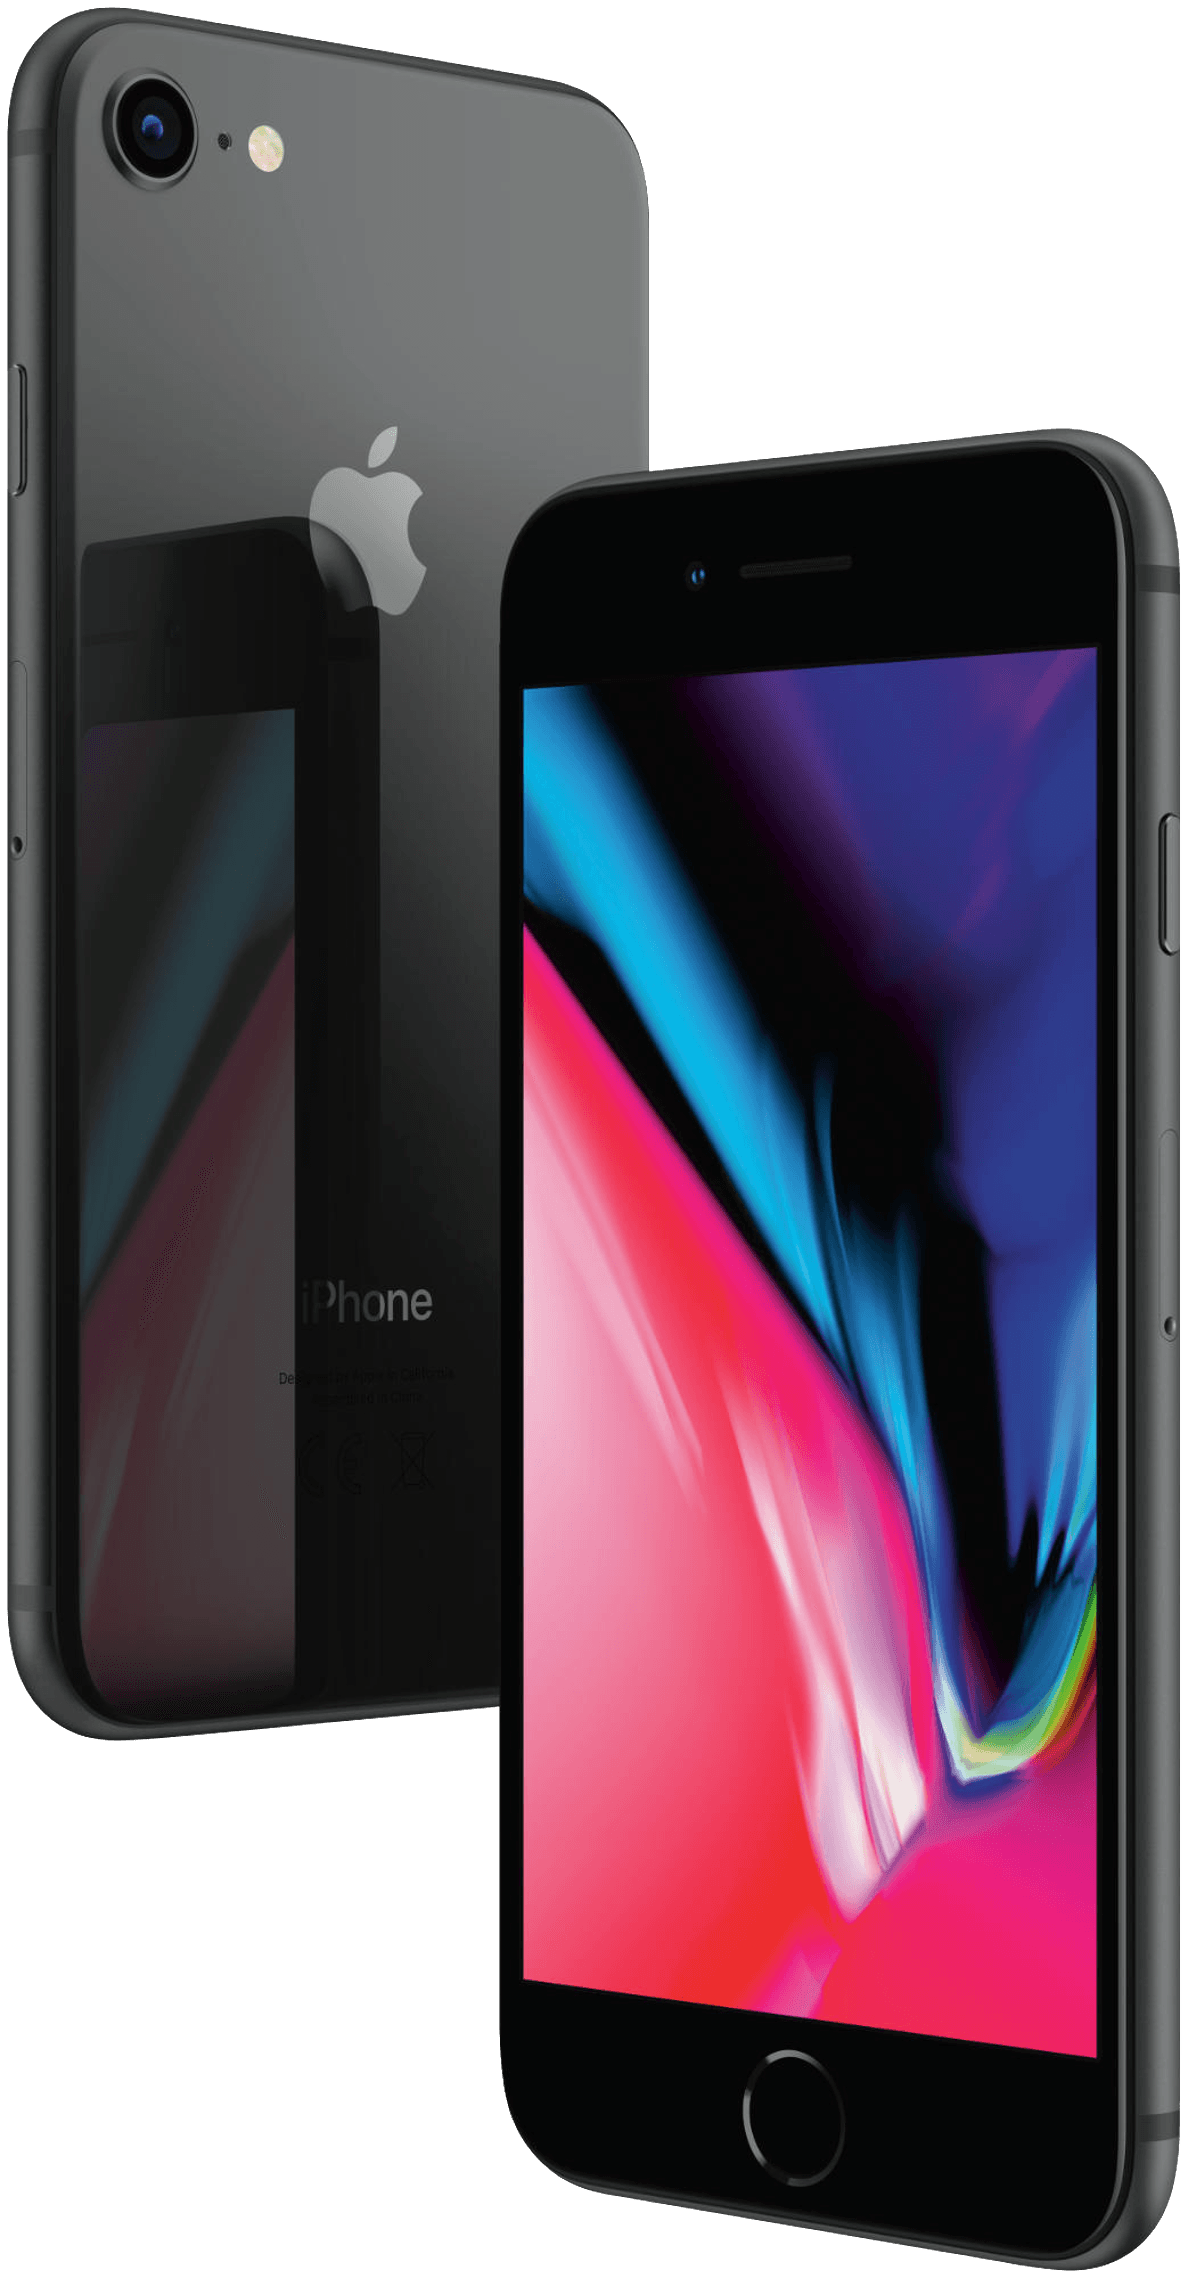 Iphone Reparatur Iphone 11 Pro Max Pro Xs X Xr X 8 7 6s Plus Iphone Reparatur Iphone Hulle Apple Iphone